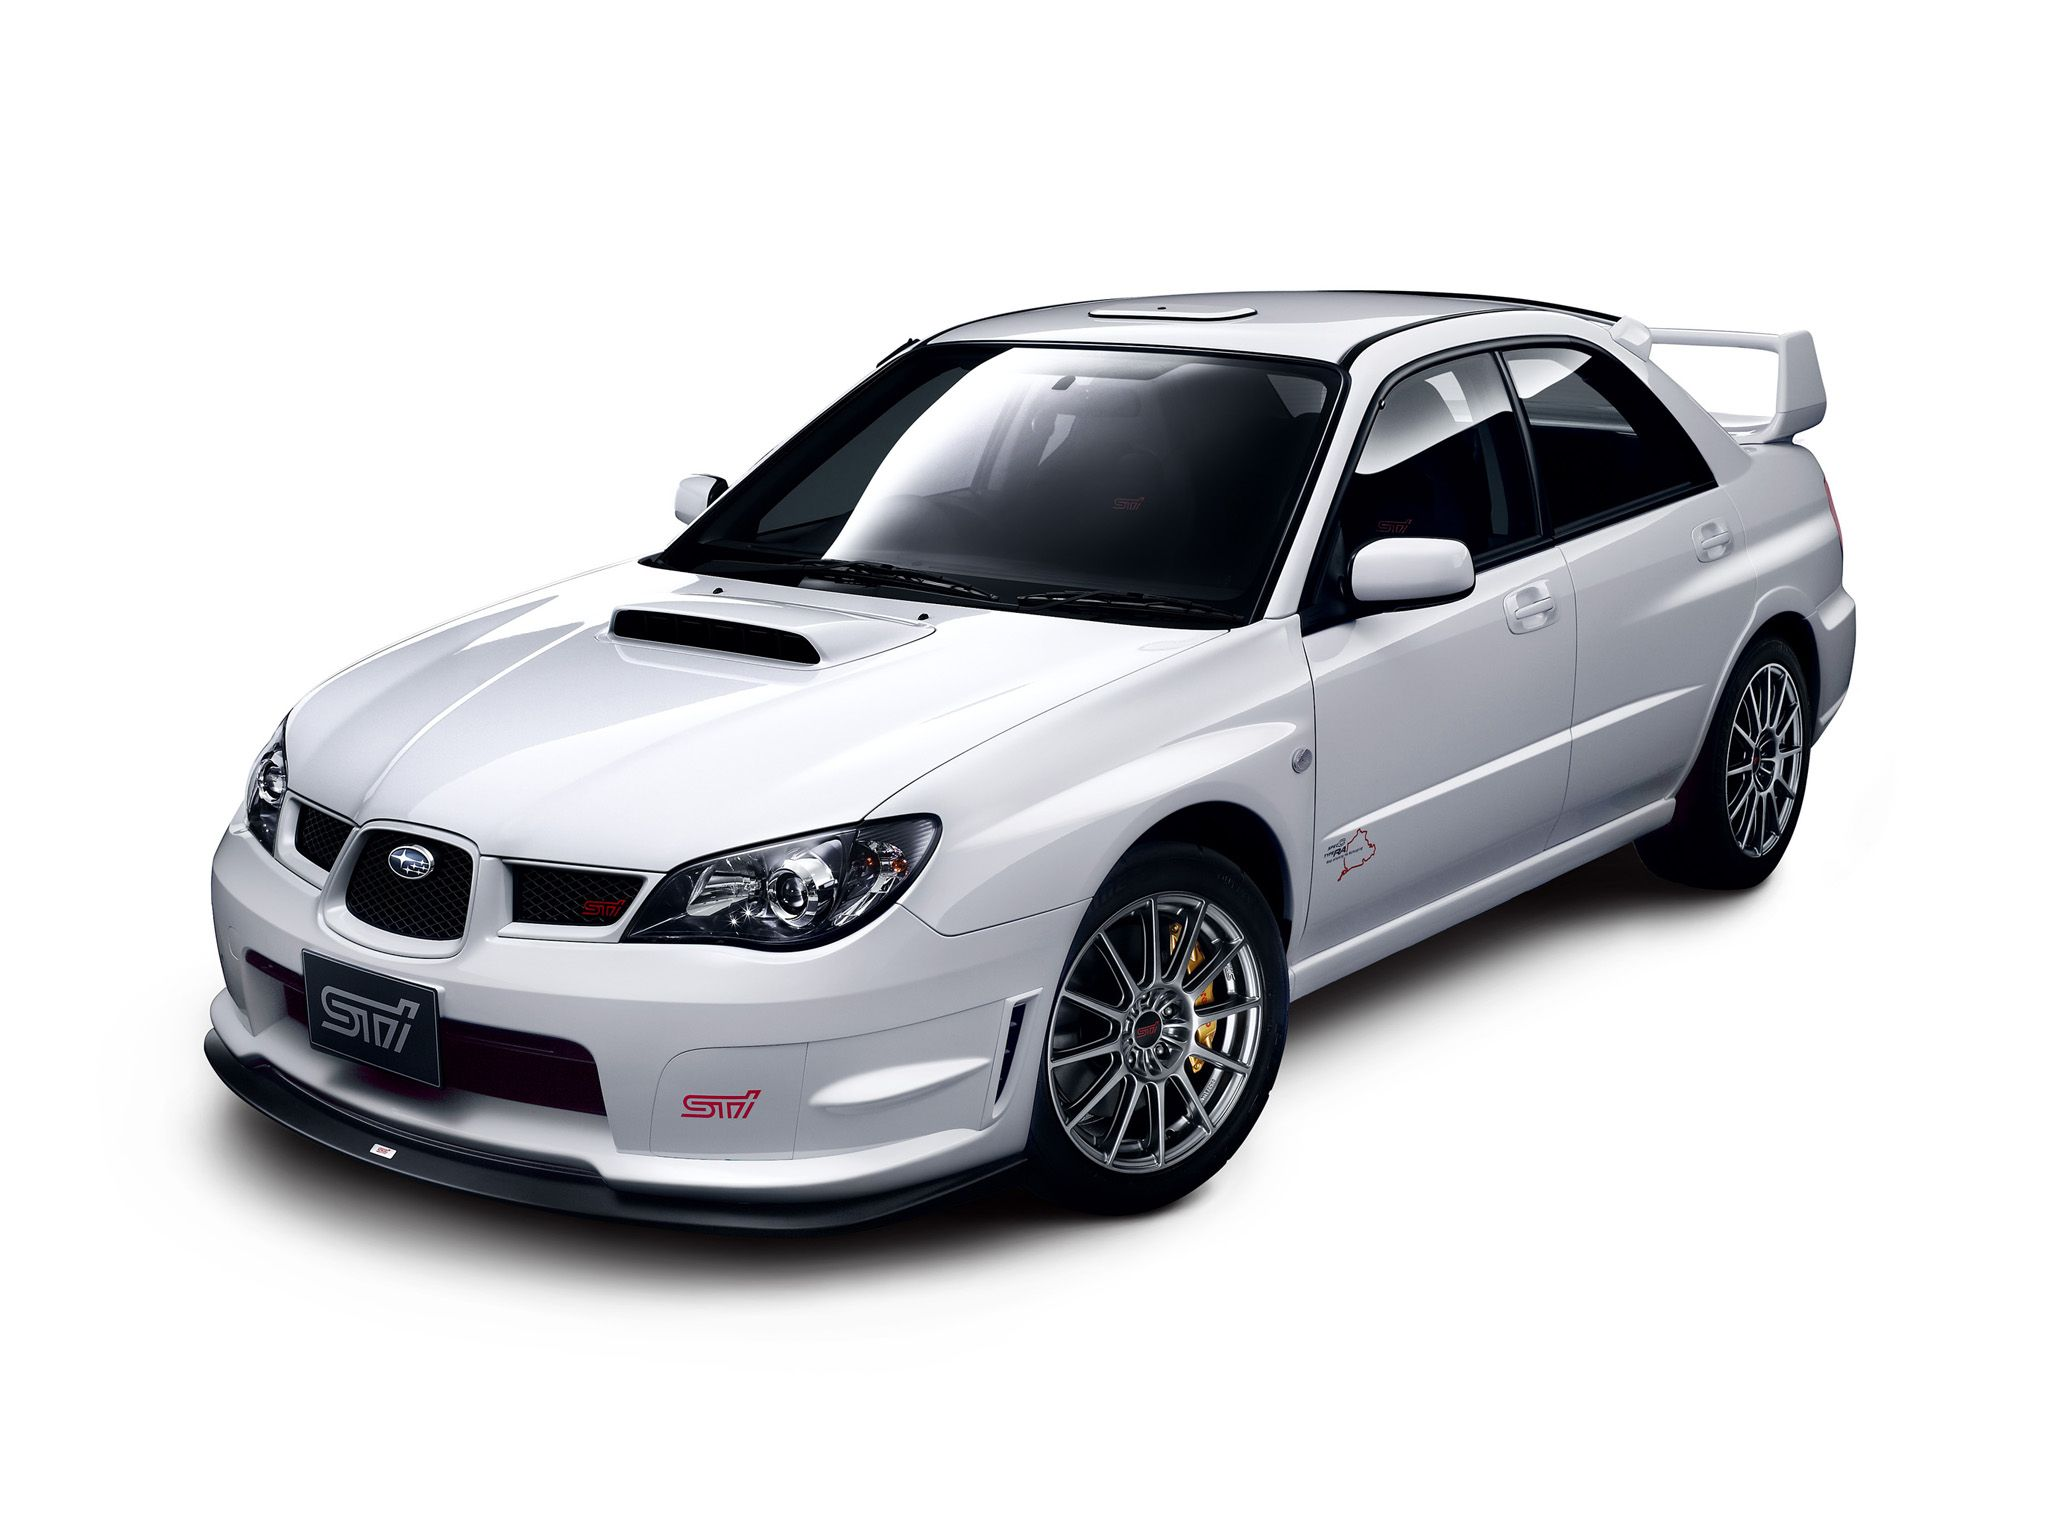 Subaru impreza wrx sti spec c type ra gdb 2006 subaru impreza subaru impreza wrx sti spec c type ra gdb 2006 vanachro Gallery